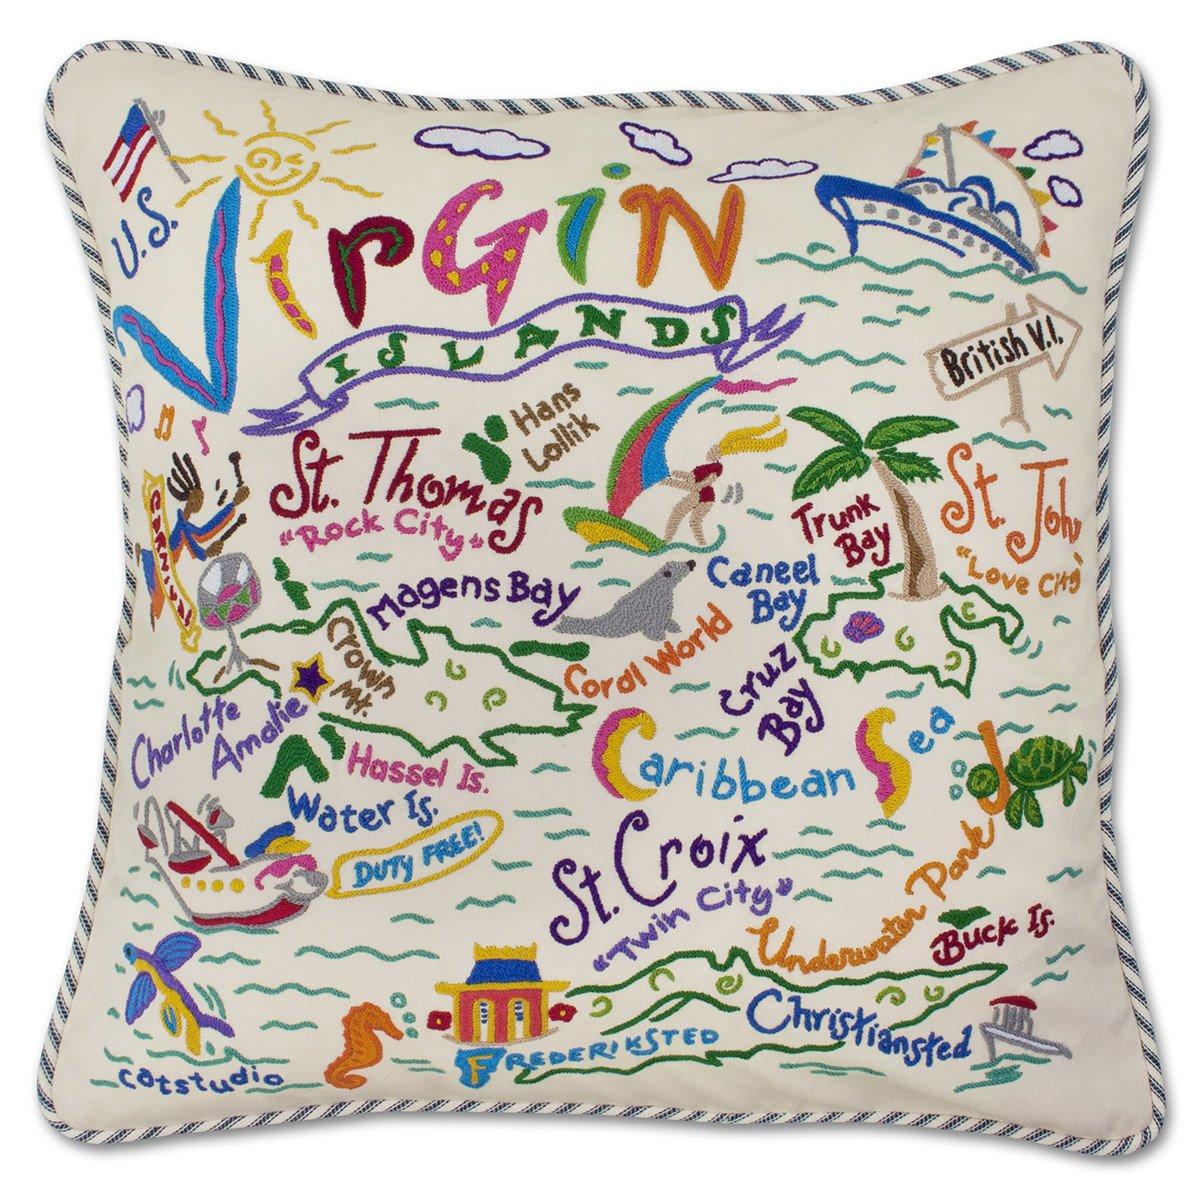 U. S. Virgin Islands Hand Embroidered Pillow by Catstudio